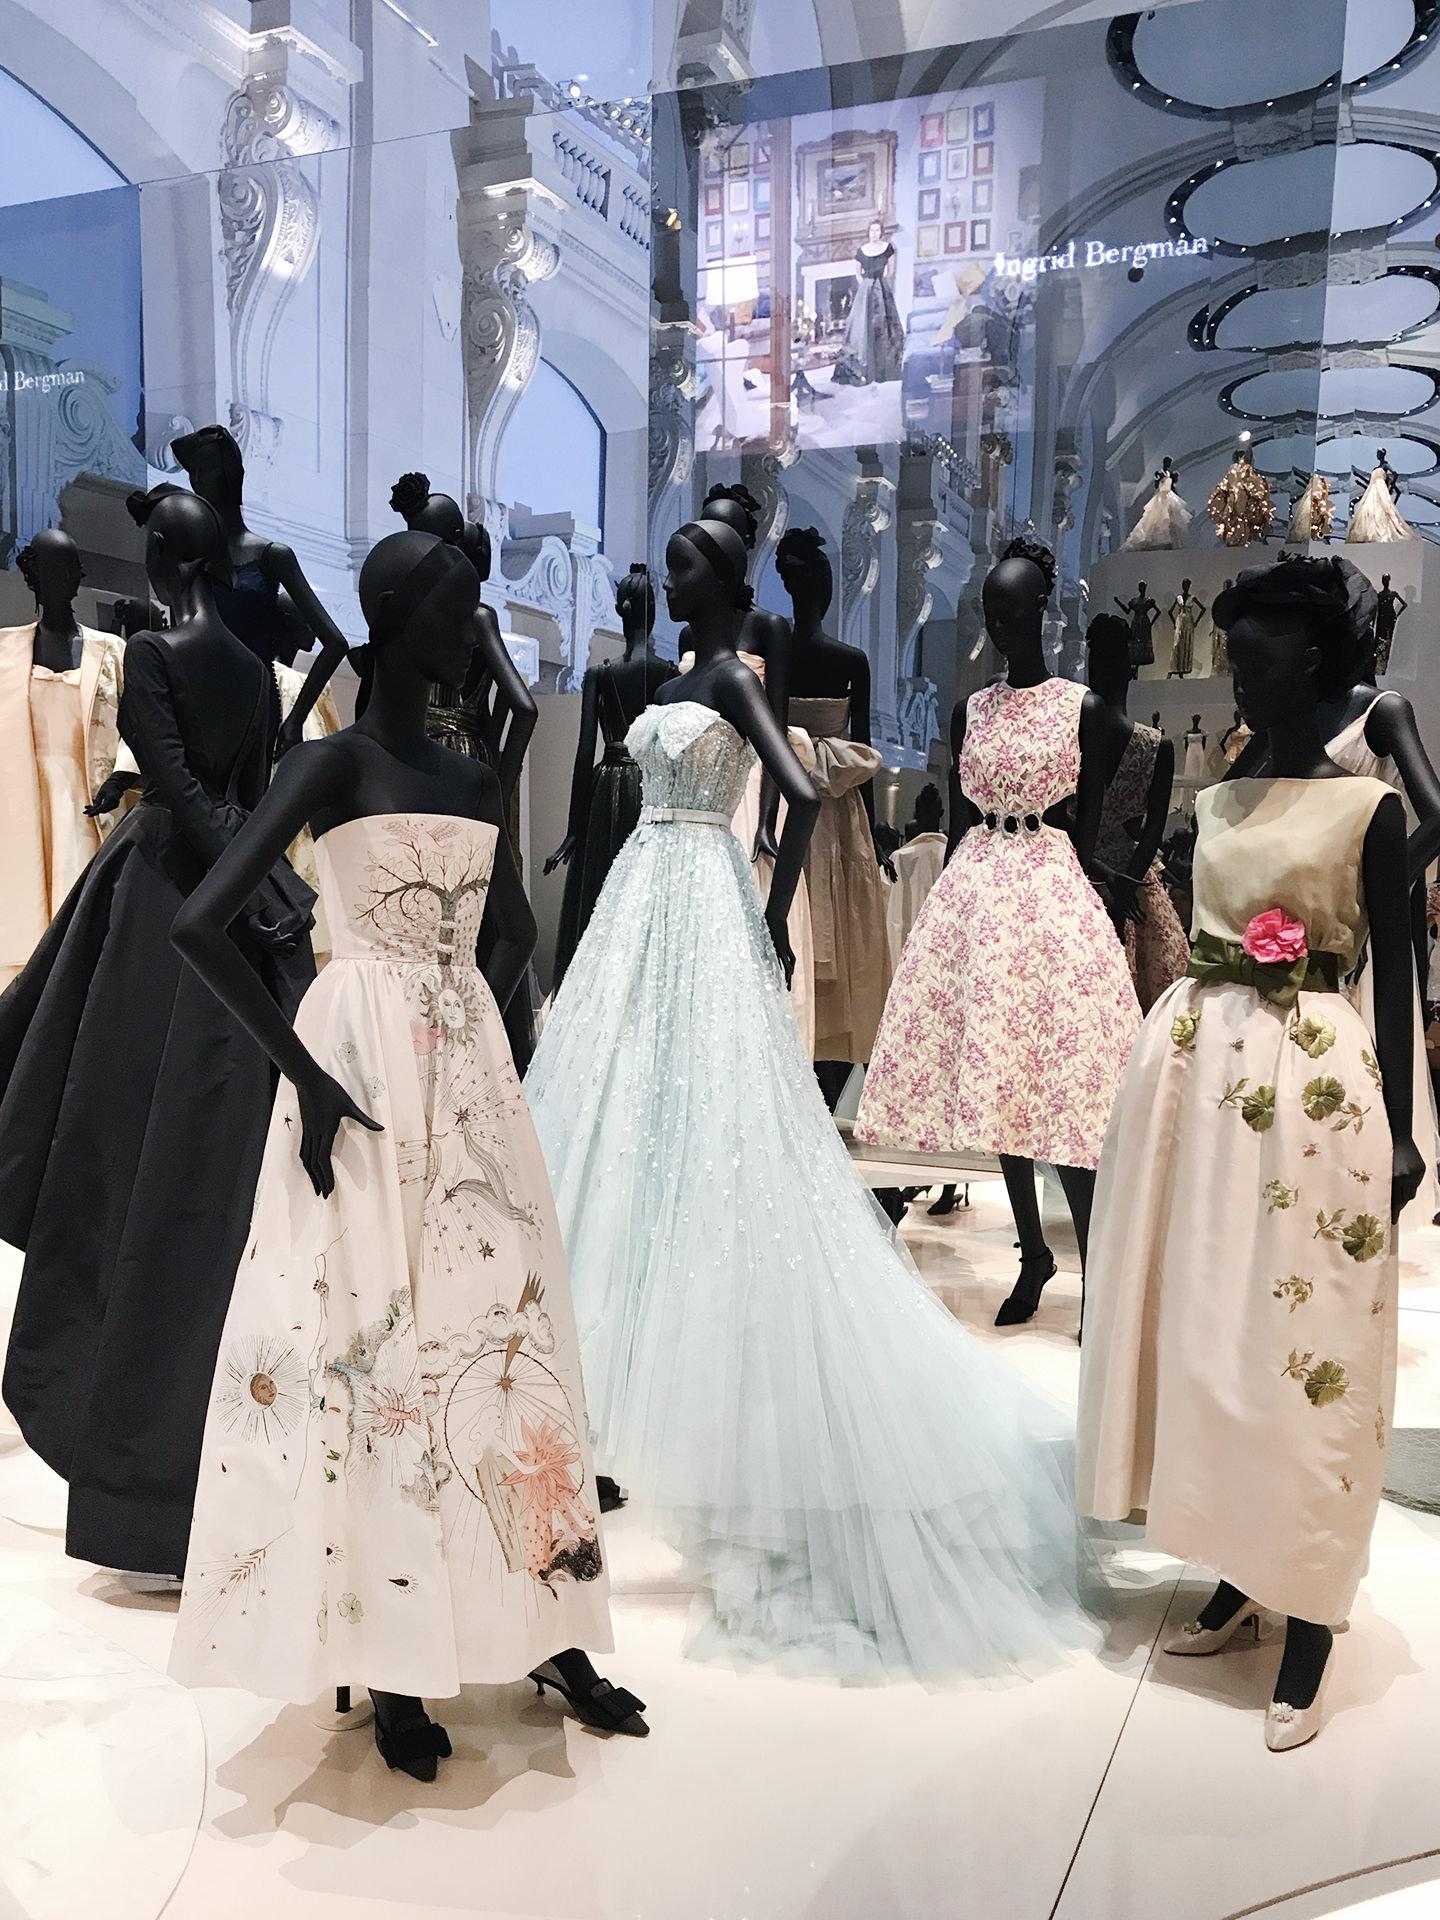 Blog-Mode-And-The-City-Lifestyle-Cinq-Petites-Choses-exposition-Dior-musee-des-arts-decoratifs